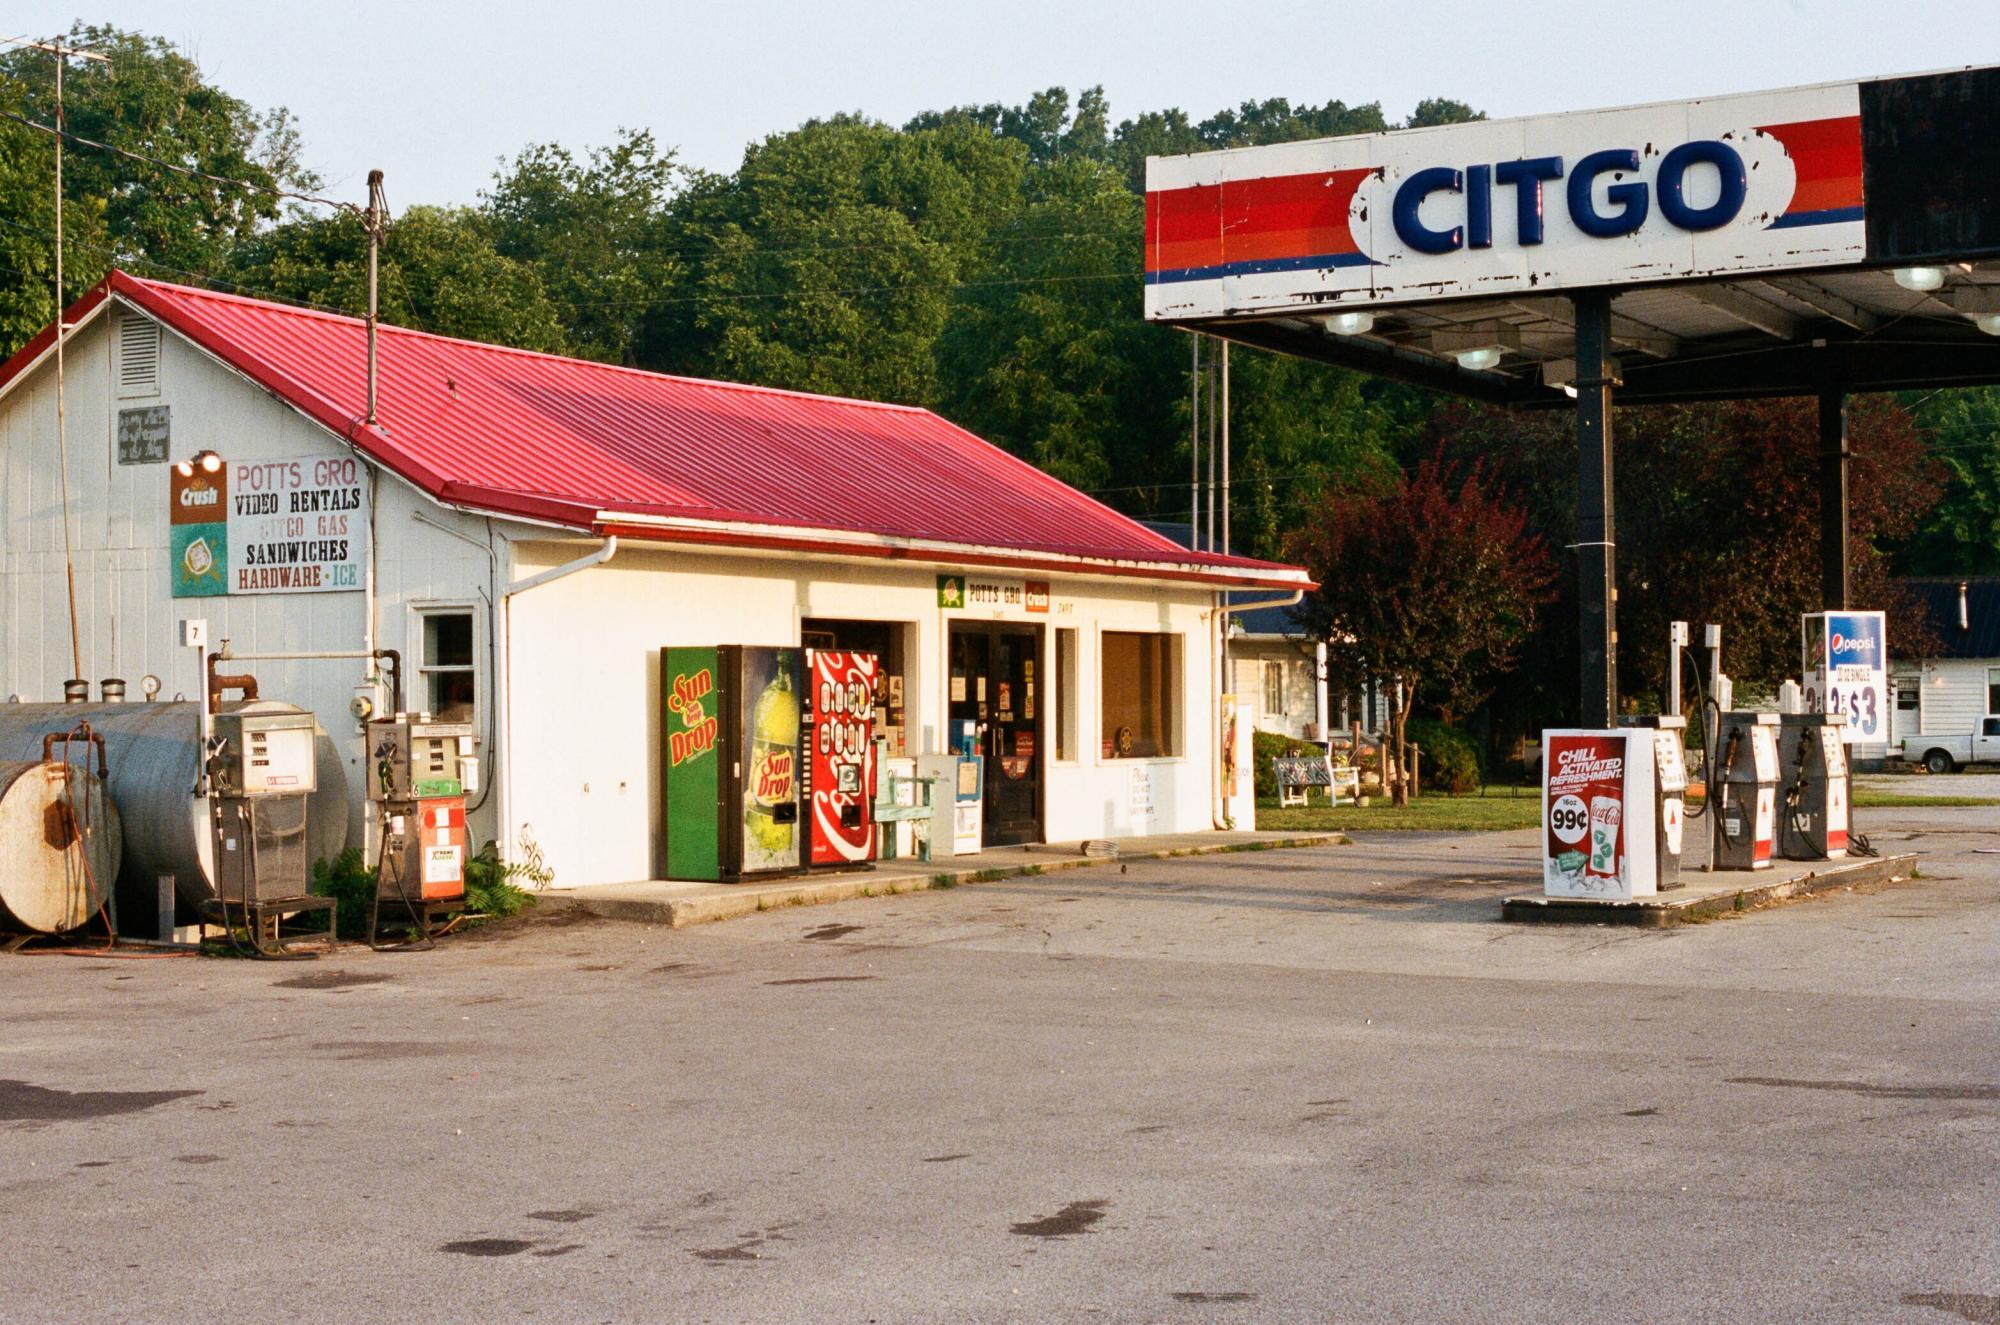 Pott's Grocery in Santa Fe, Tennessee